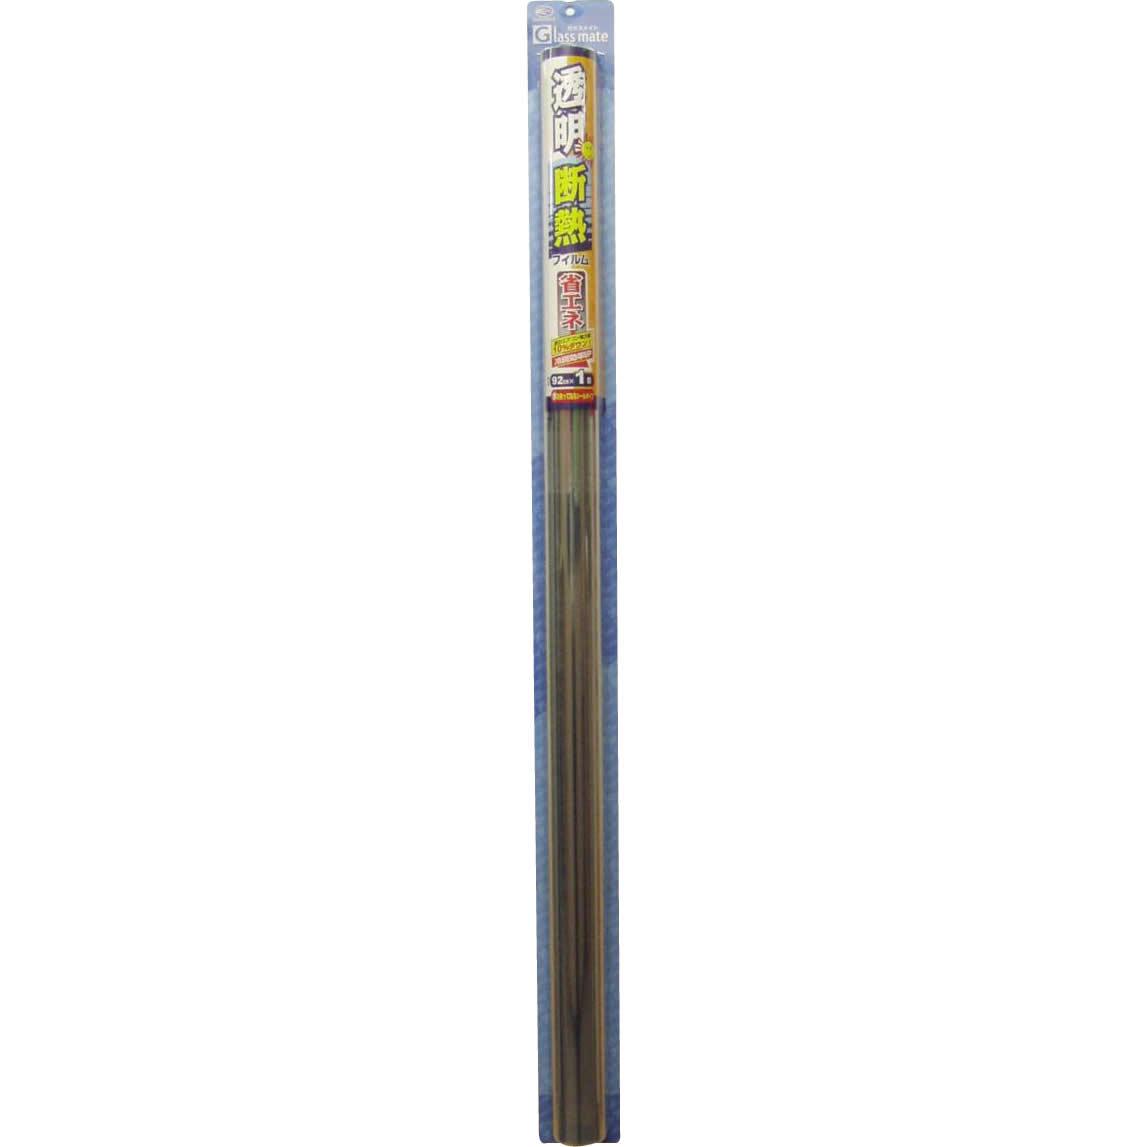 UVカット+省エネ機能がついた 透明断熱フィルム 92×20m IR-05R【エコ商品】